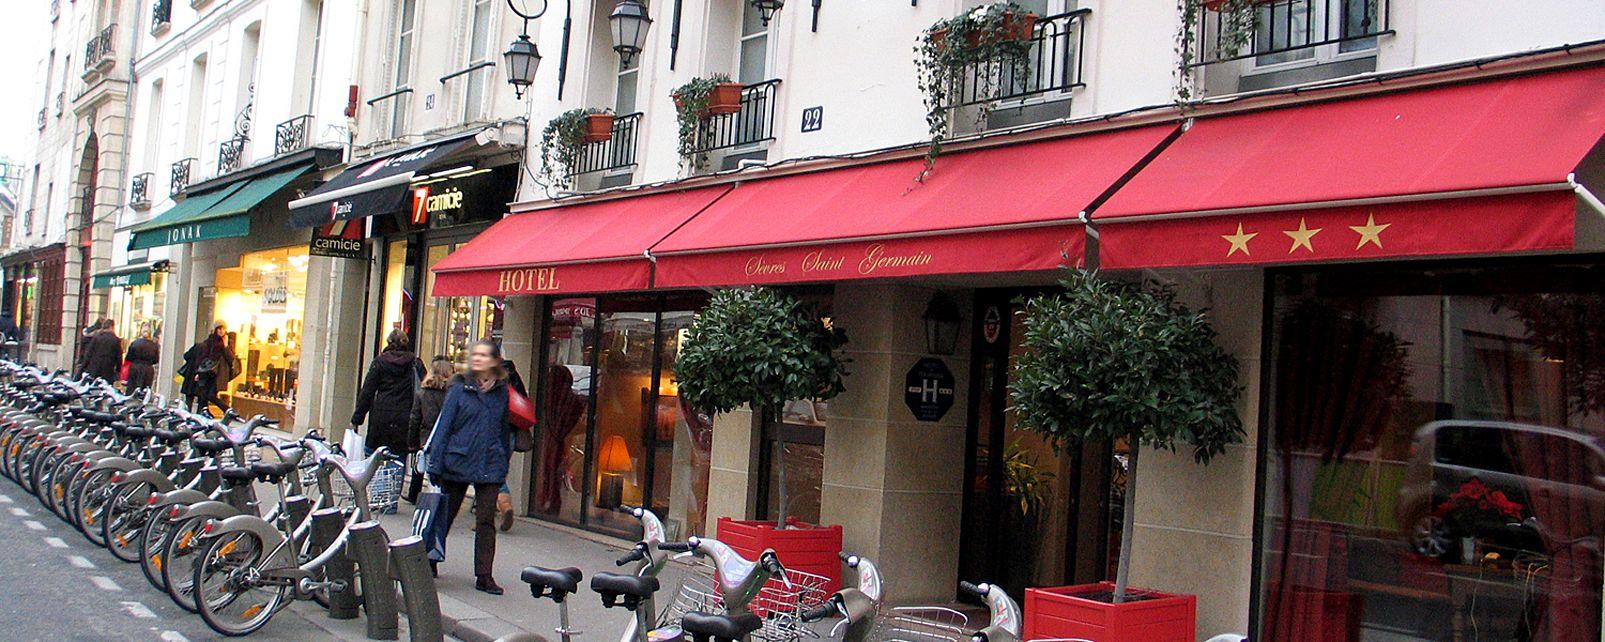 Hotel Sevres St Germain